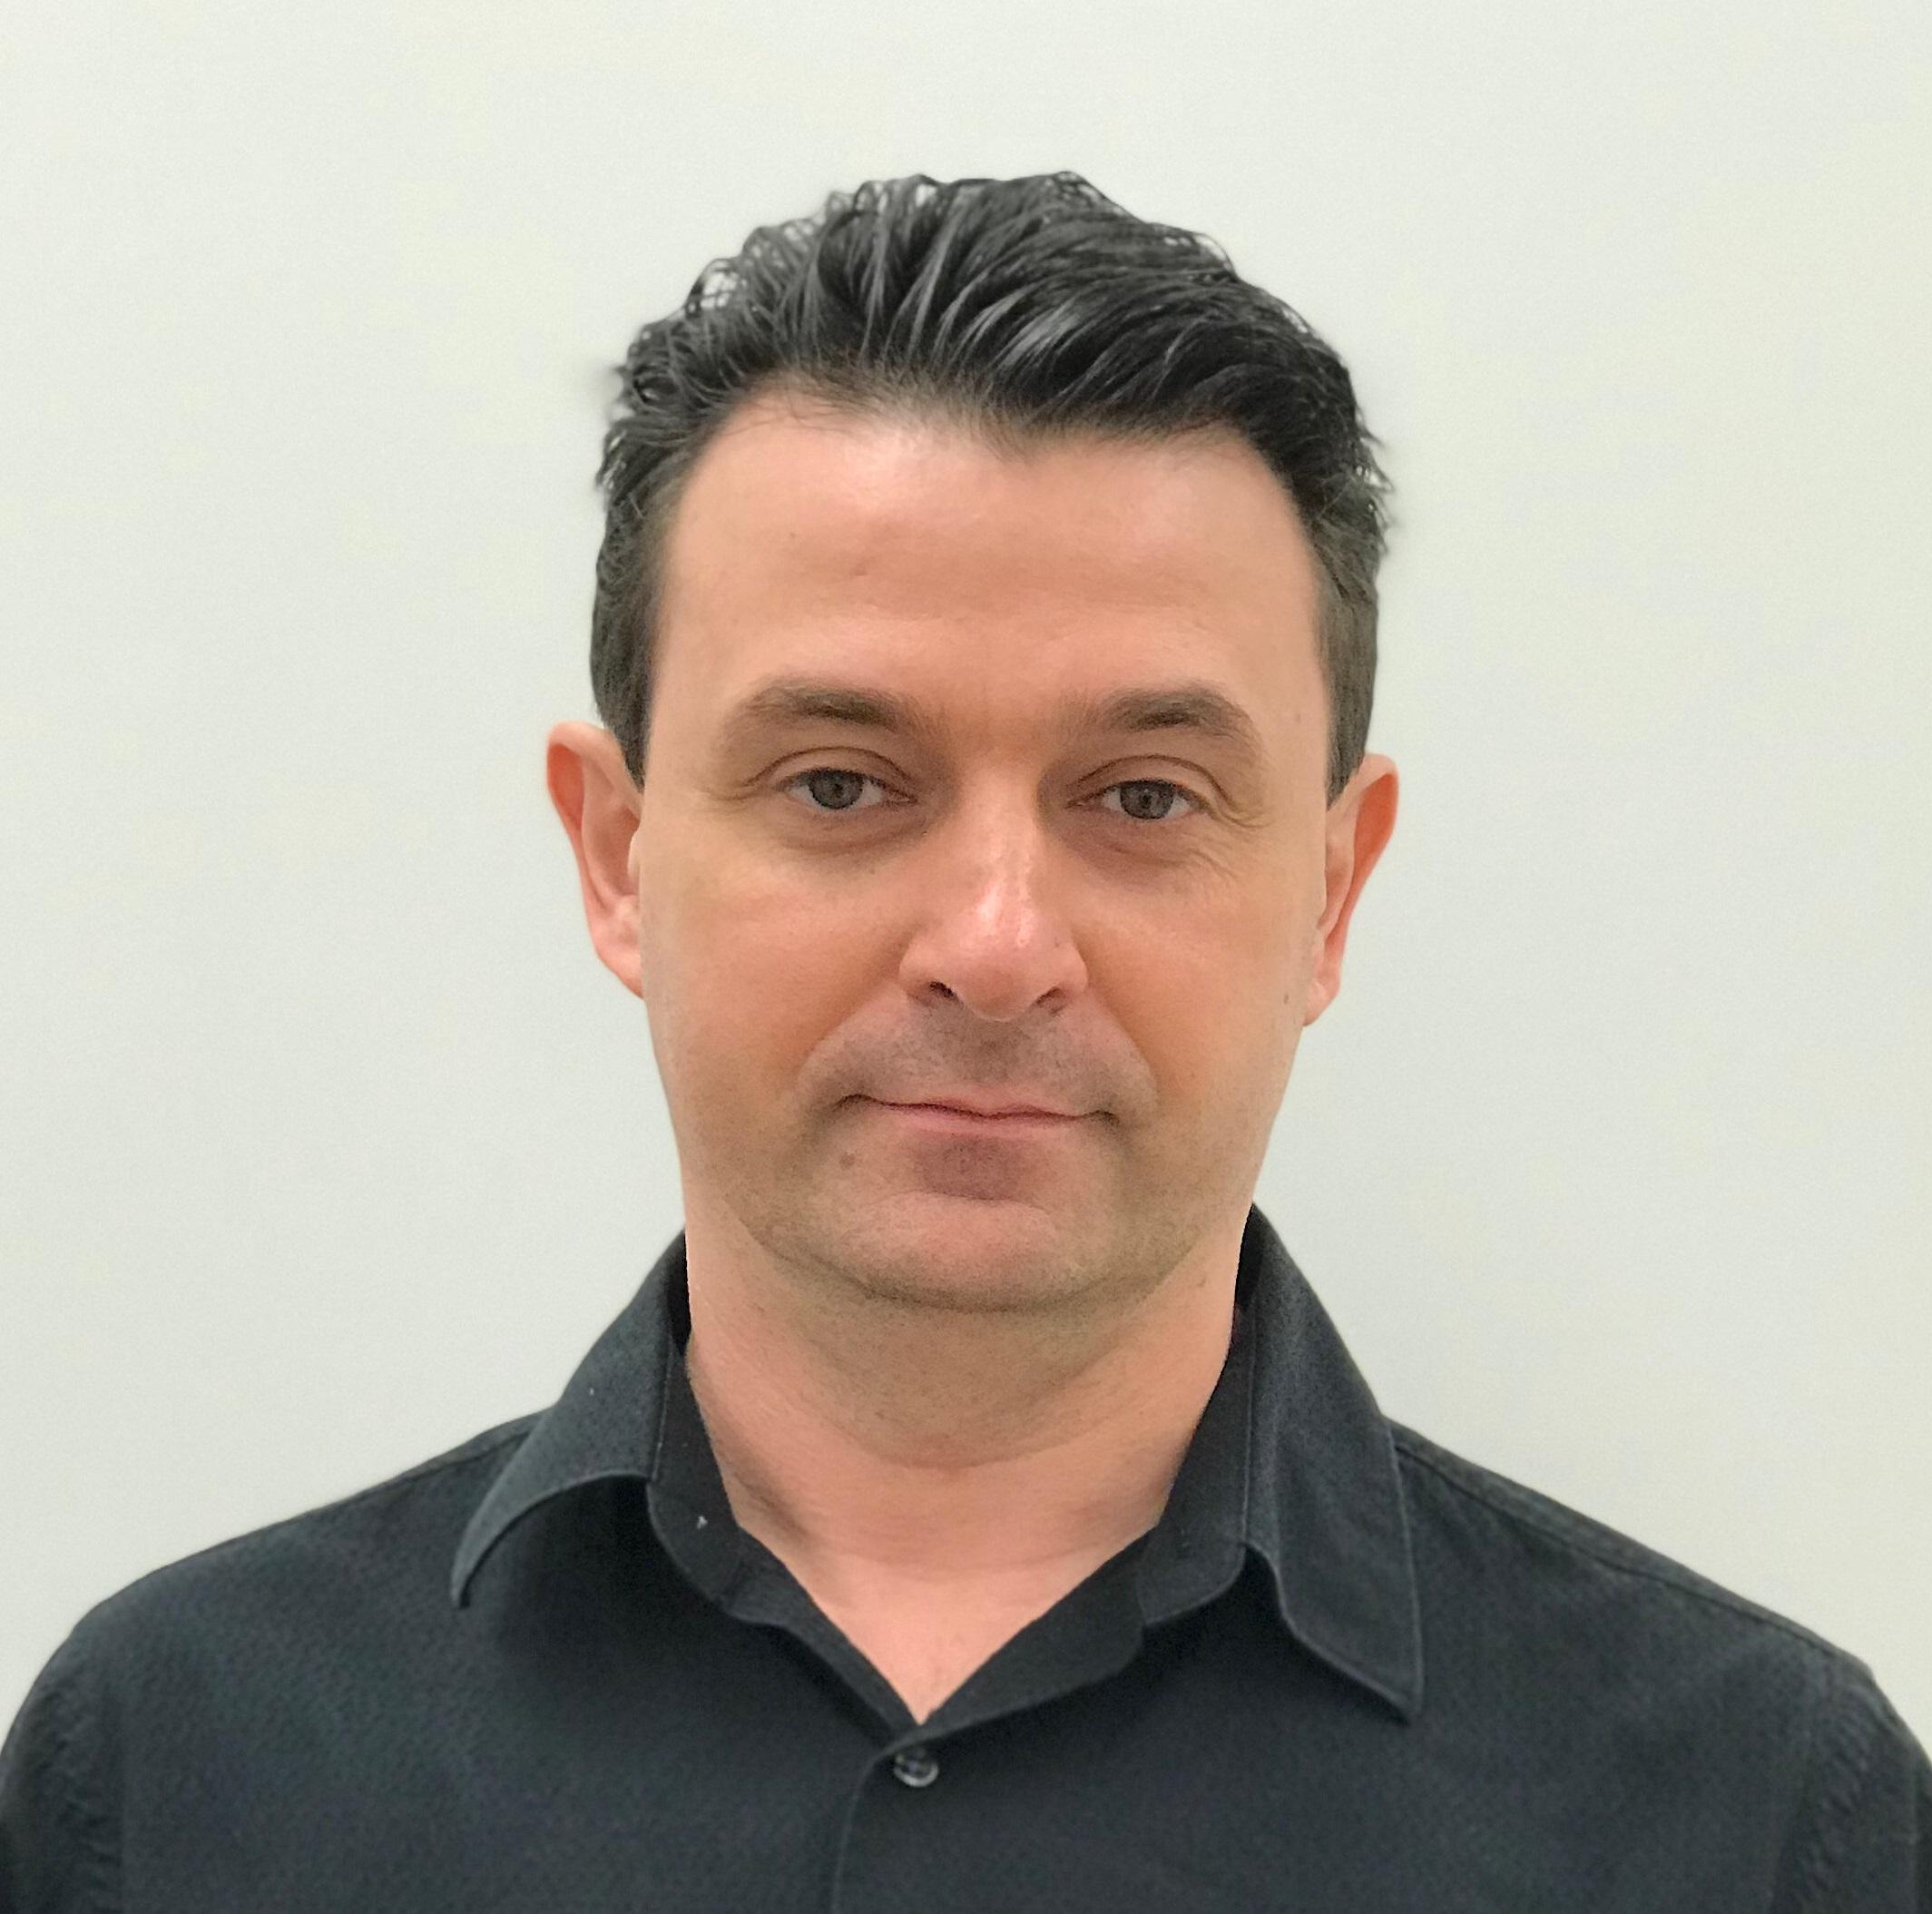 Tomas Bryczek